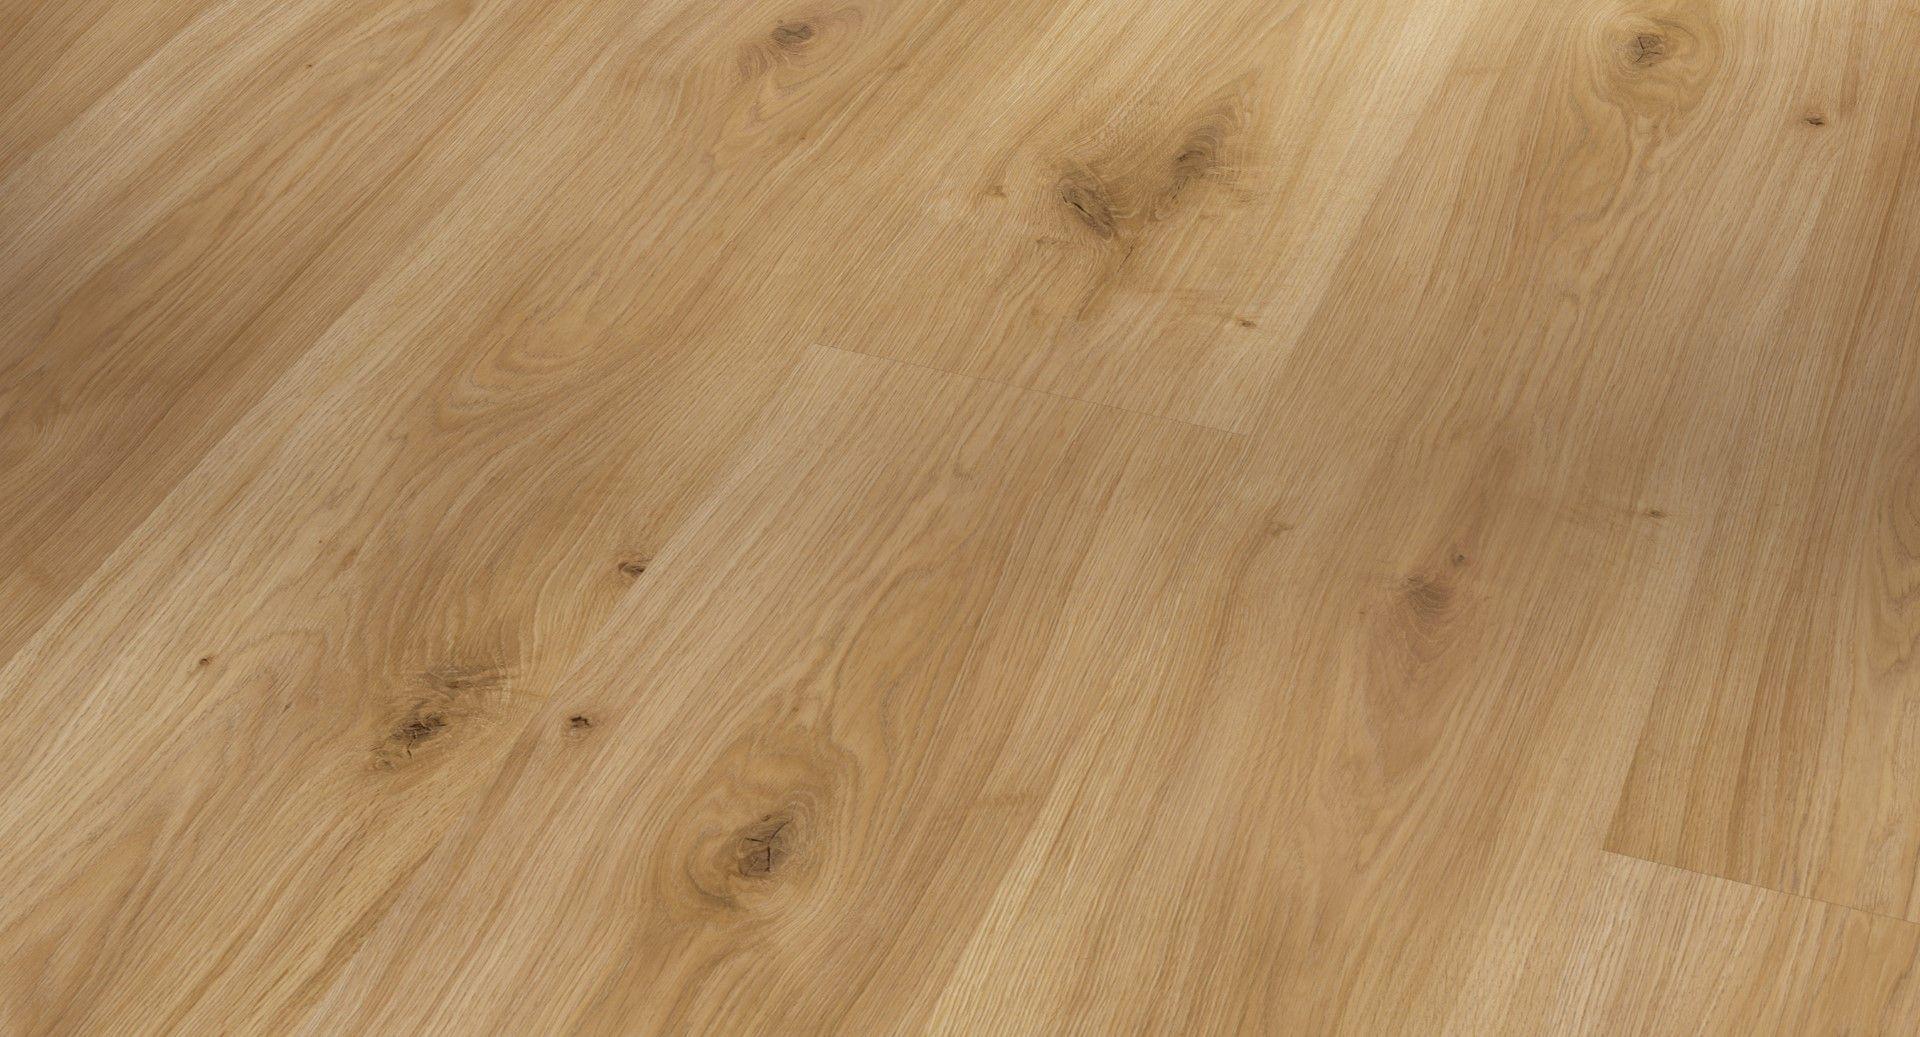 Oak Horizont natural in 2020 Flooring, Laminate flooring